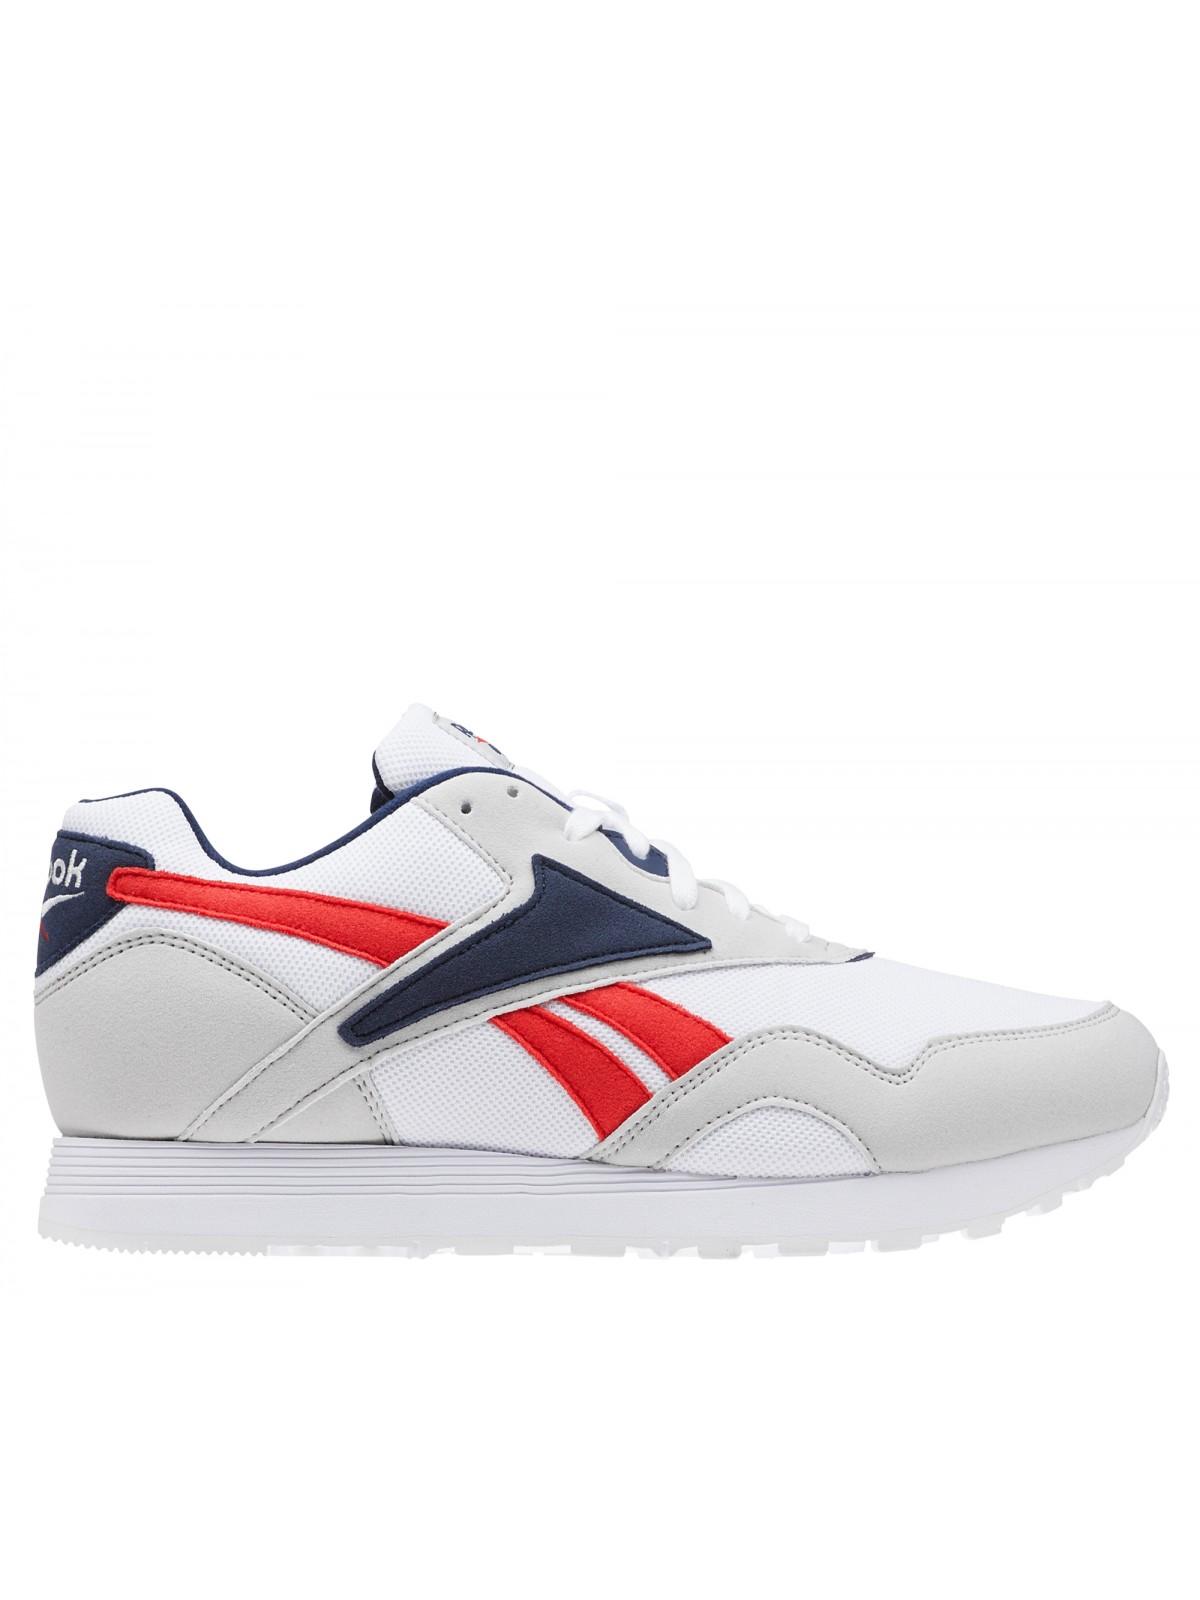 bleu reebok et blanche blanche reebok rouge 8wkOPn0